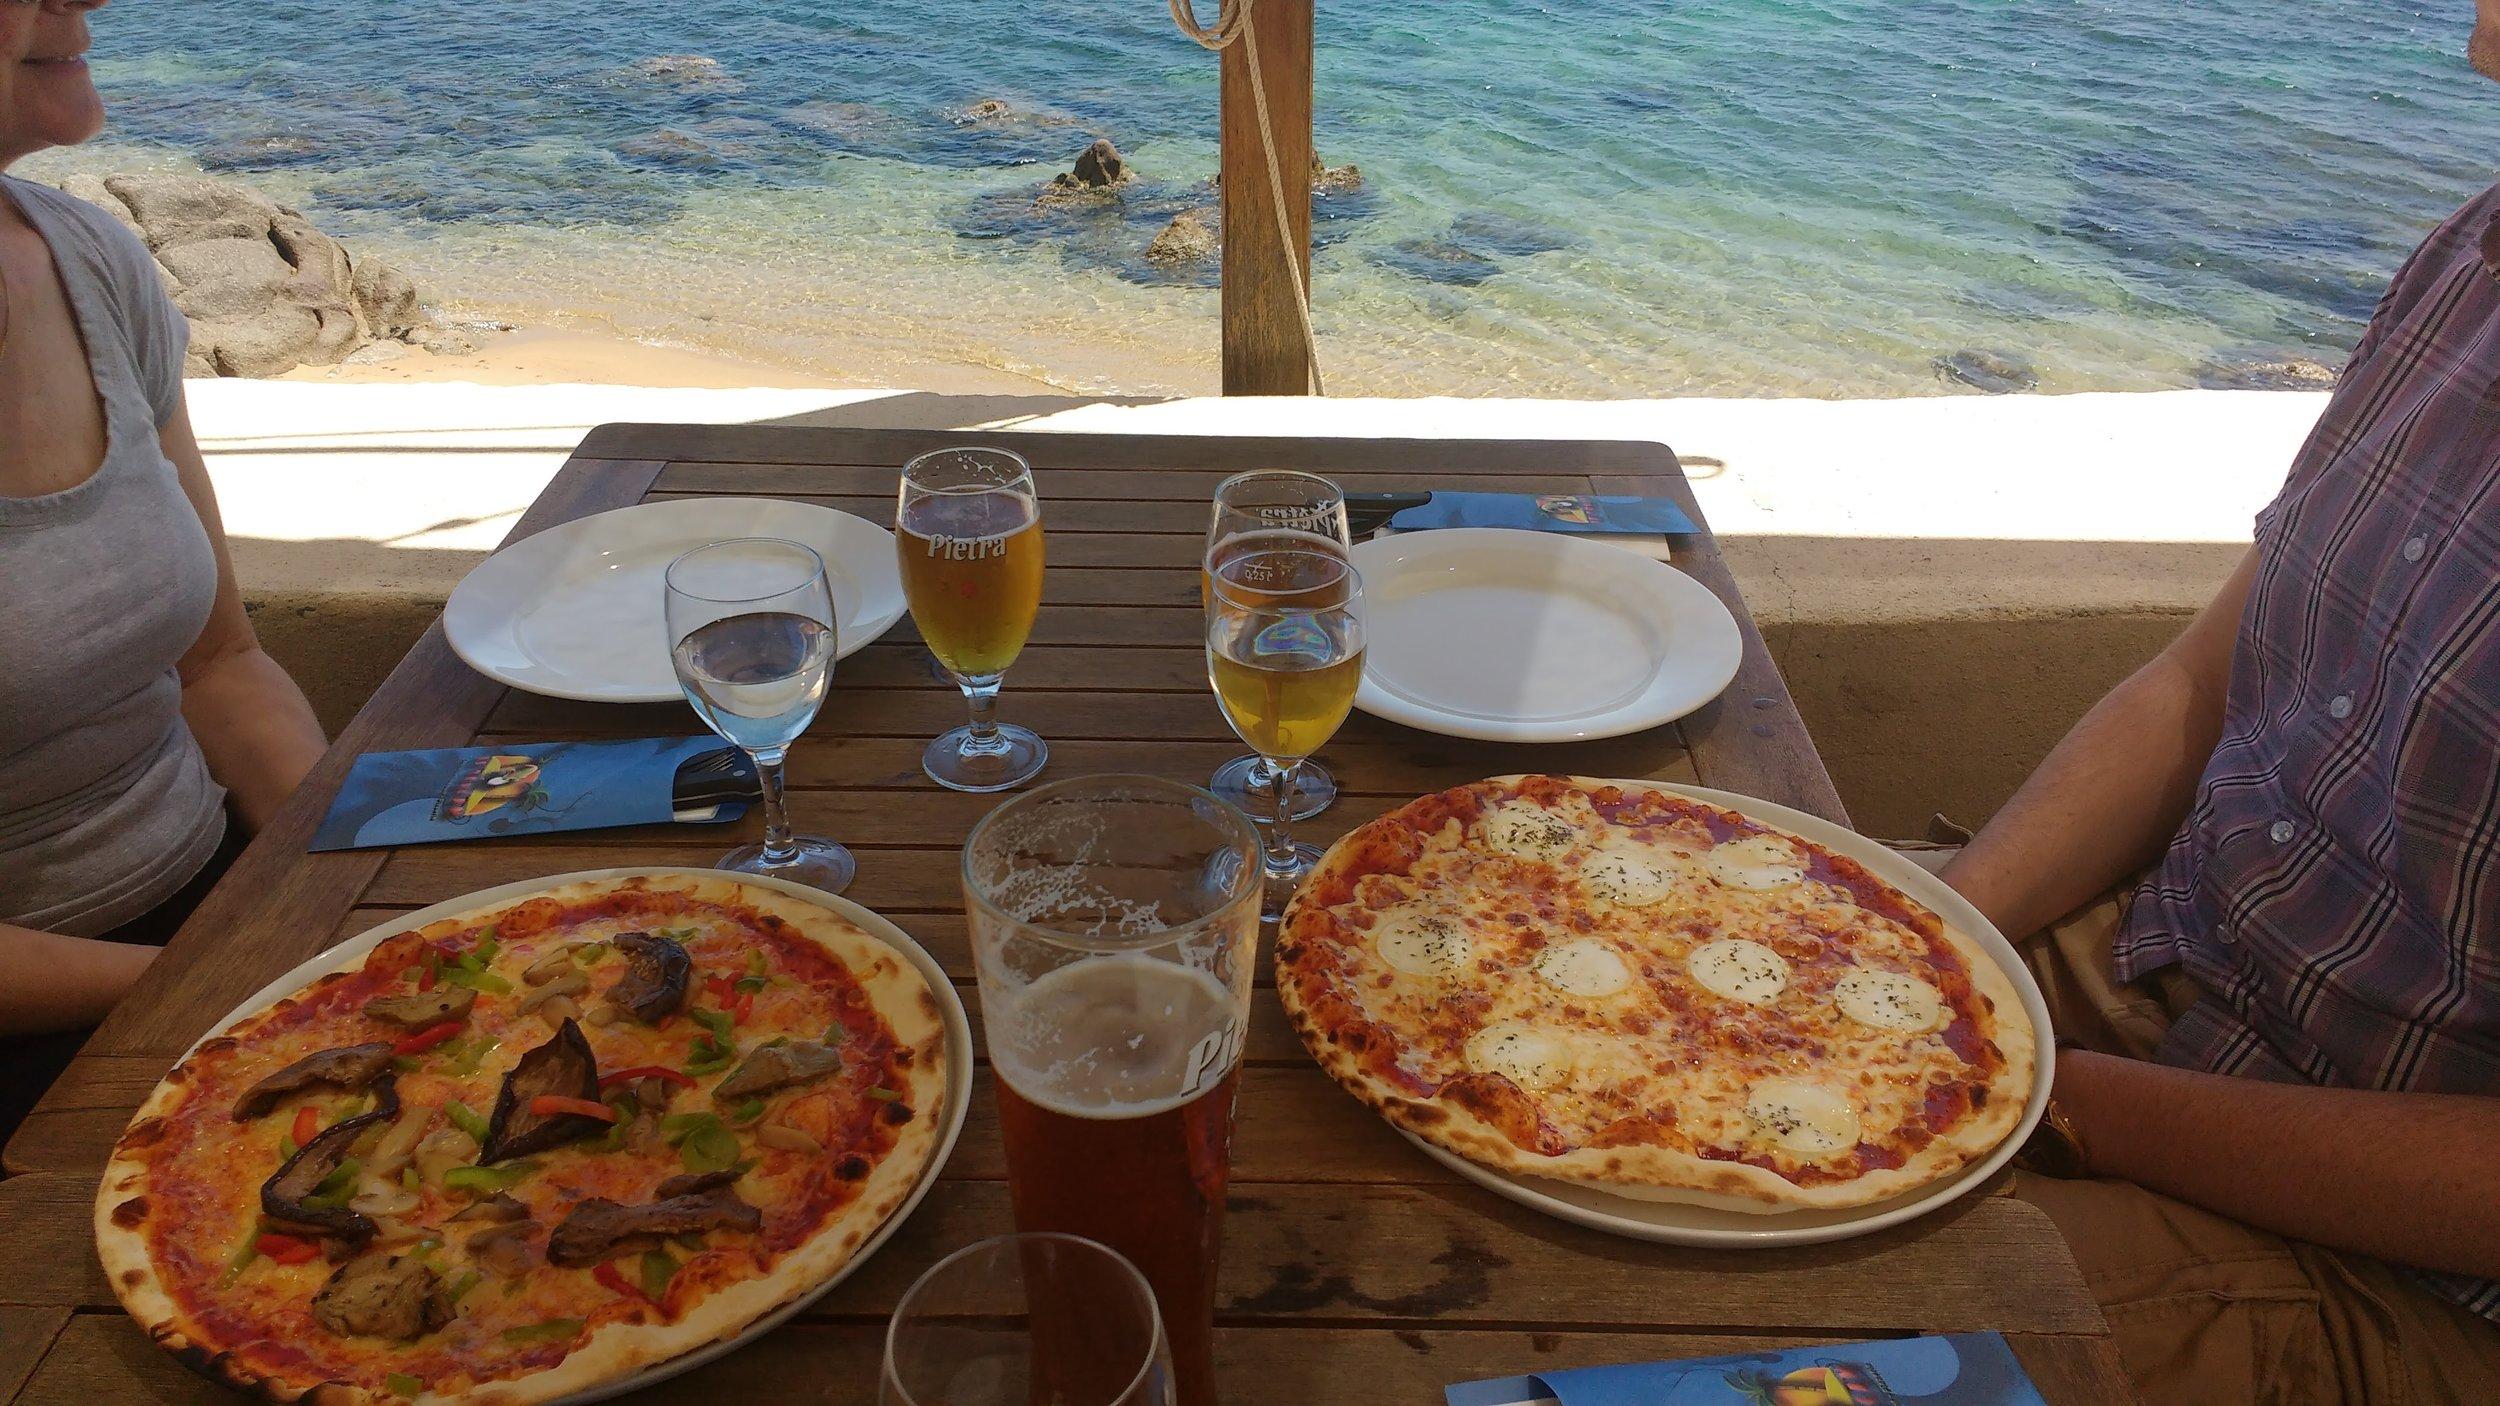 Italian thin crust pizza overlooking the Mediterranean in Corsica!